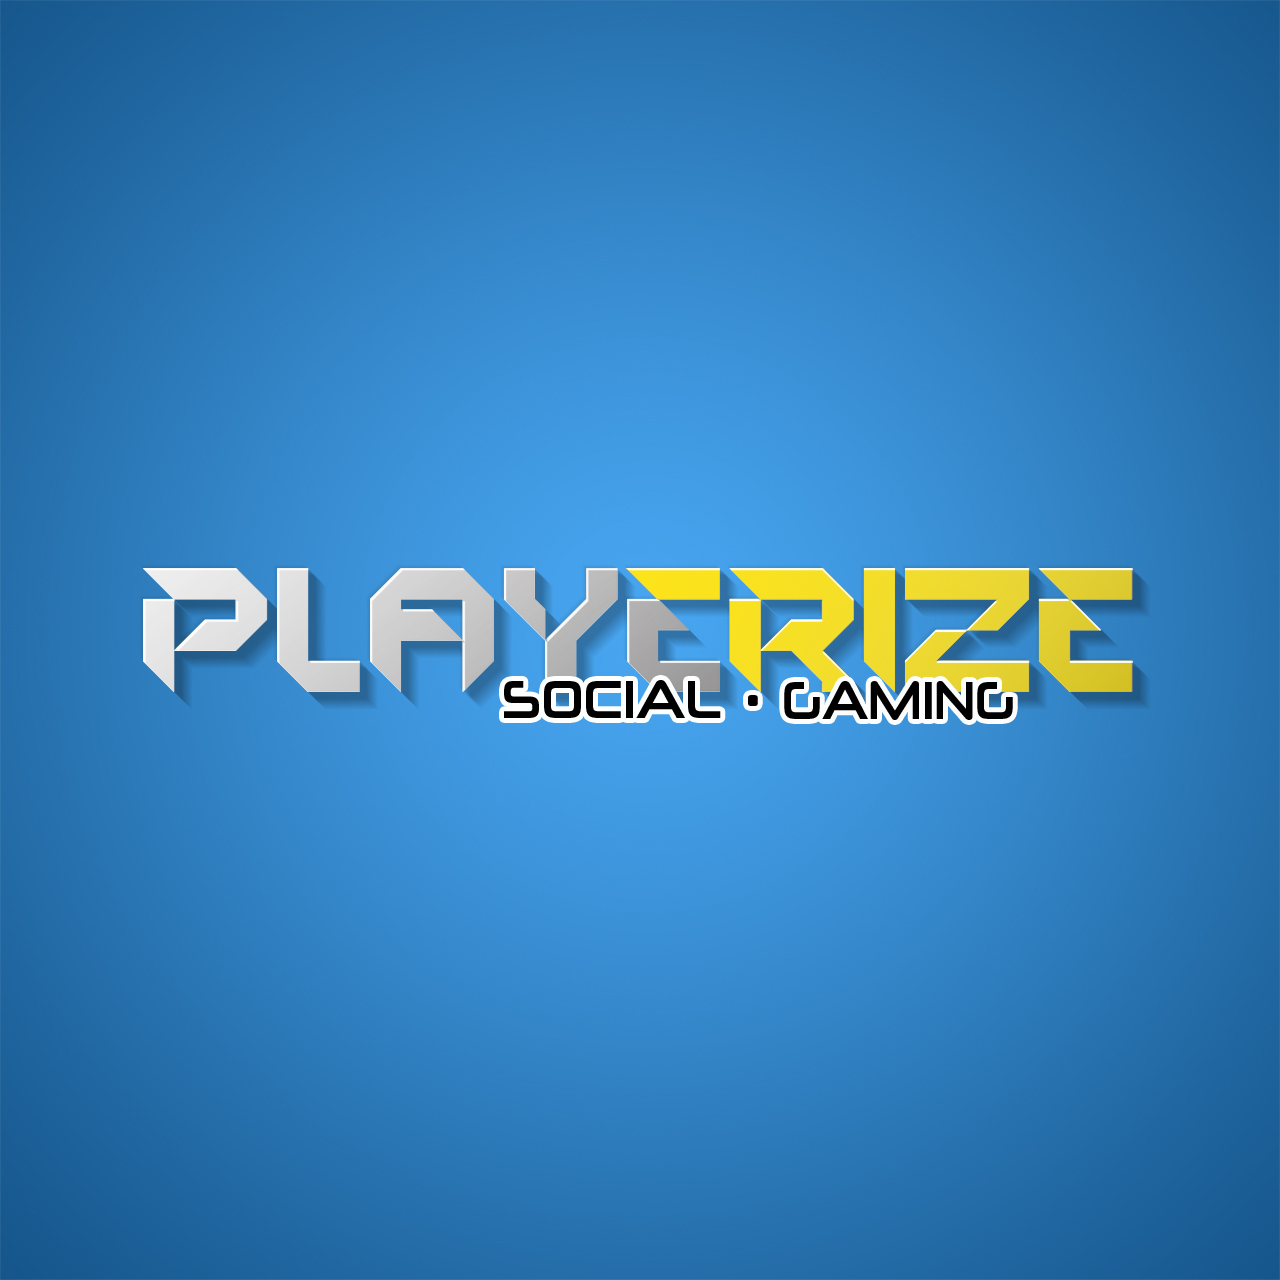 Logo Design by Beau.Design - Entry No. 34 in the Logo Design Contest Social Gaming Logo!.